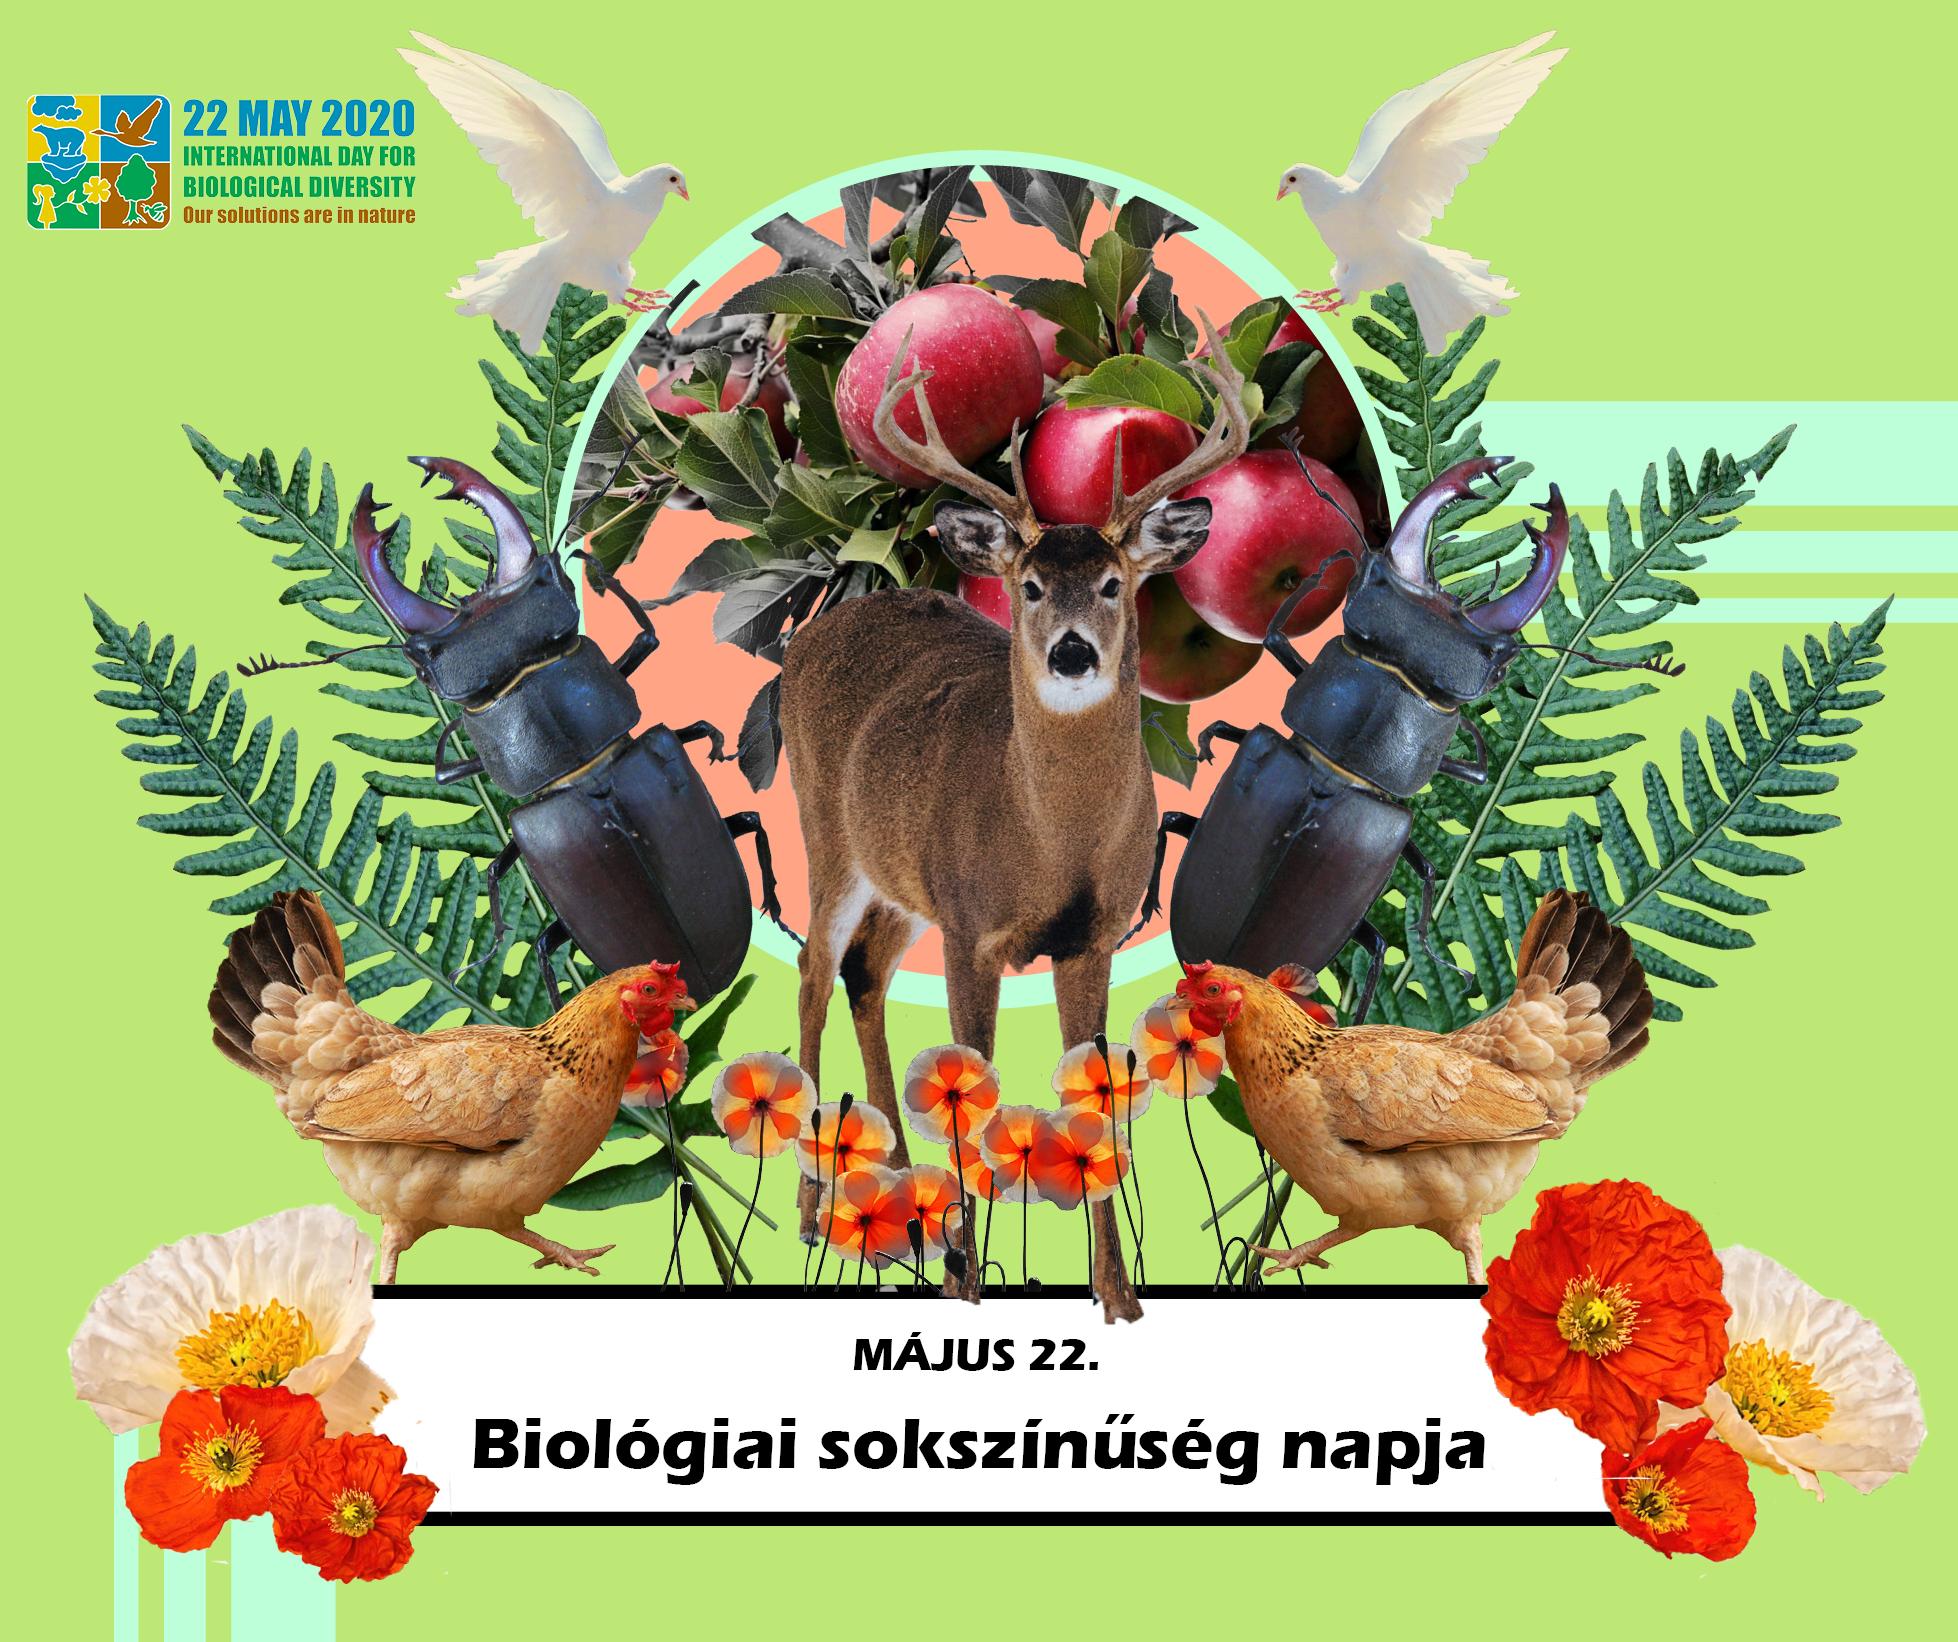 05_22_biodiverzitas_2.jpg